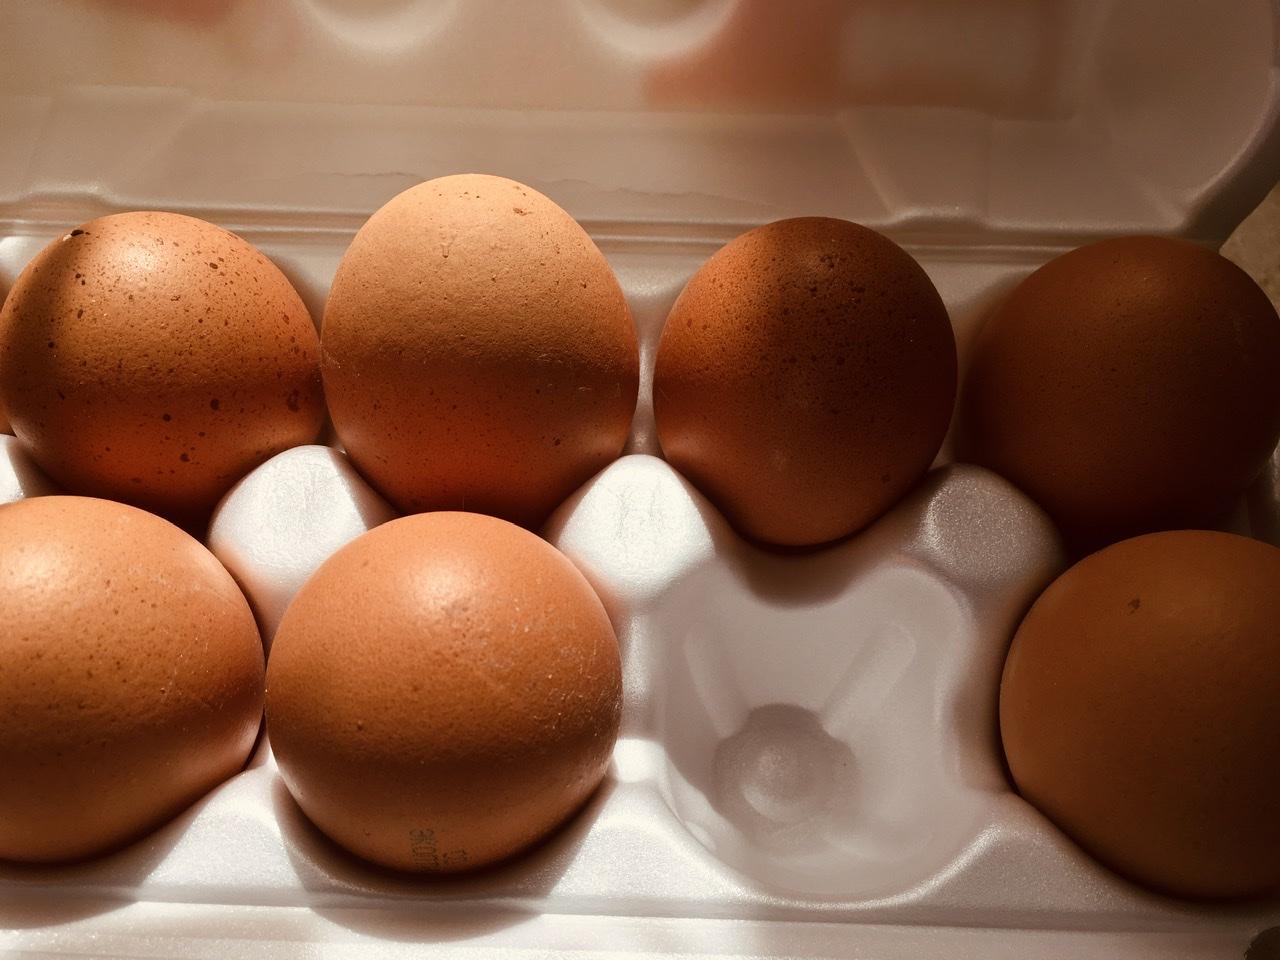 яйца, еда